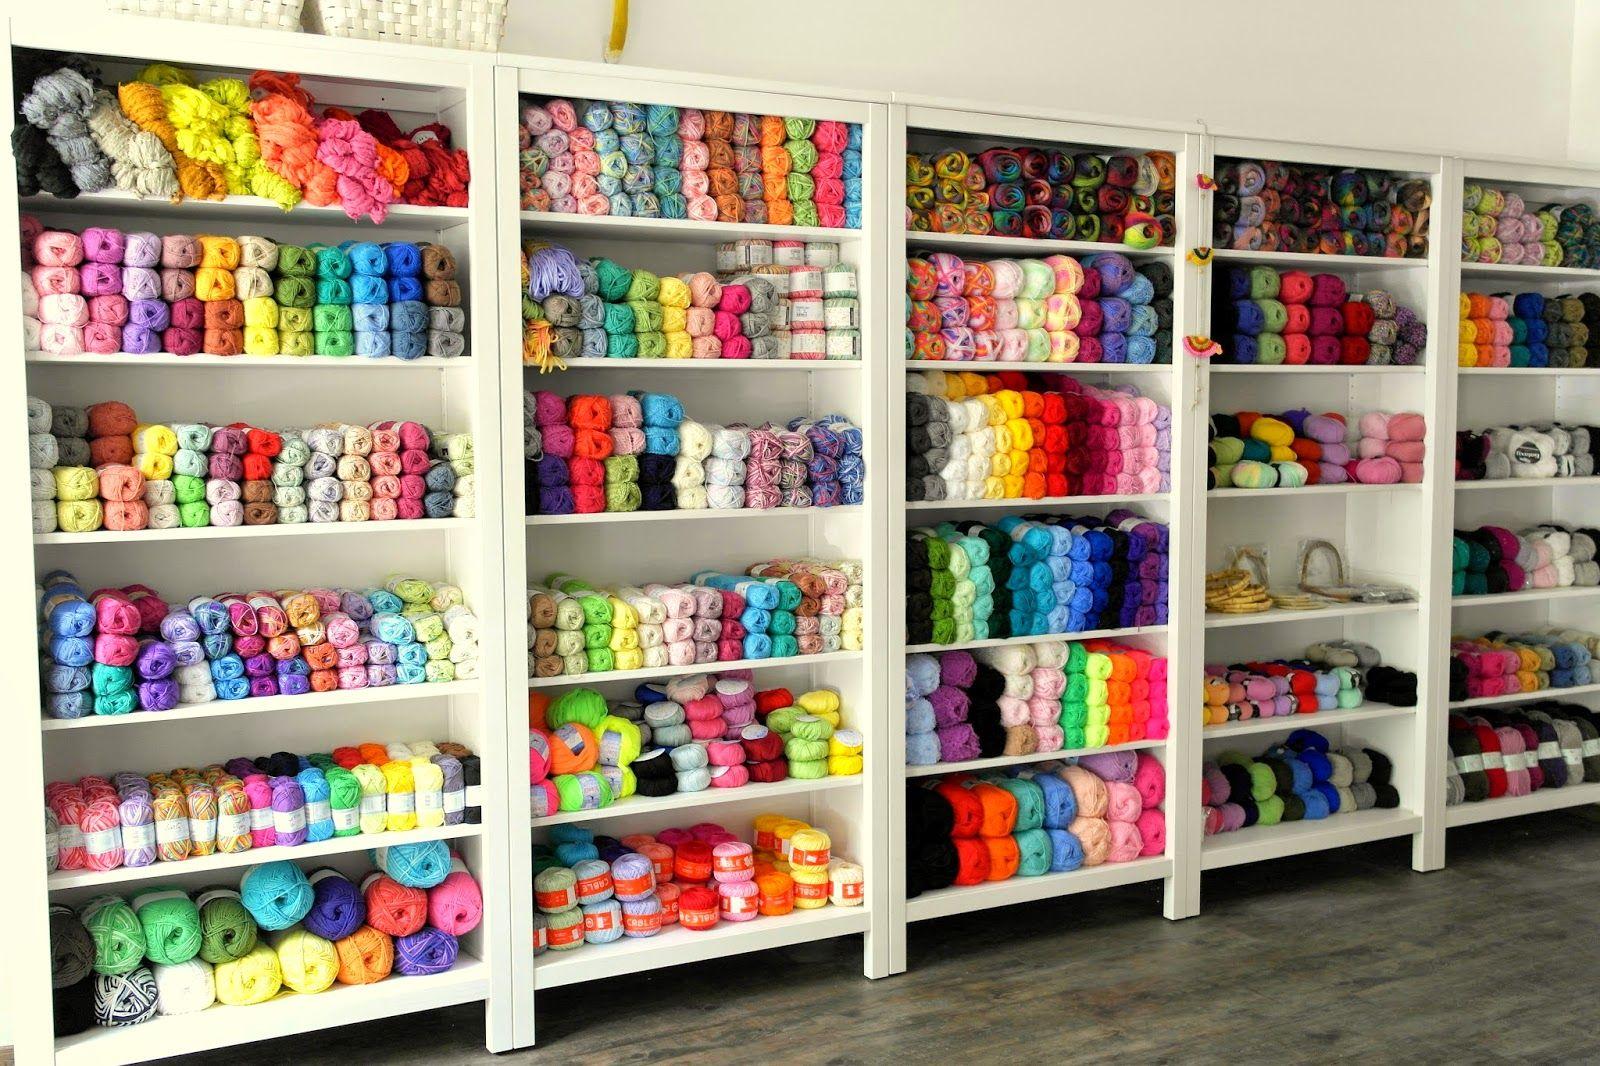 yarn shop knitting crochet supplies bratislava slovakia